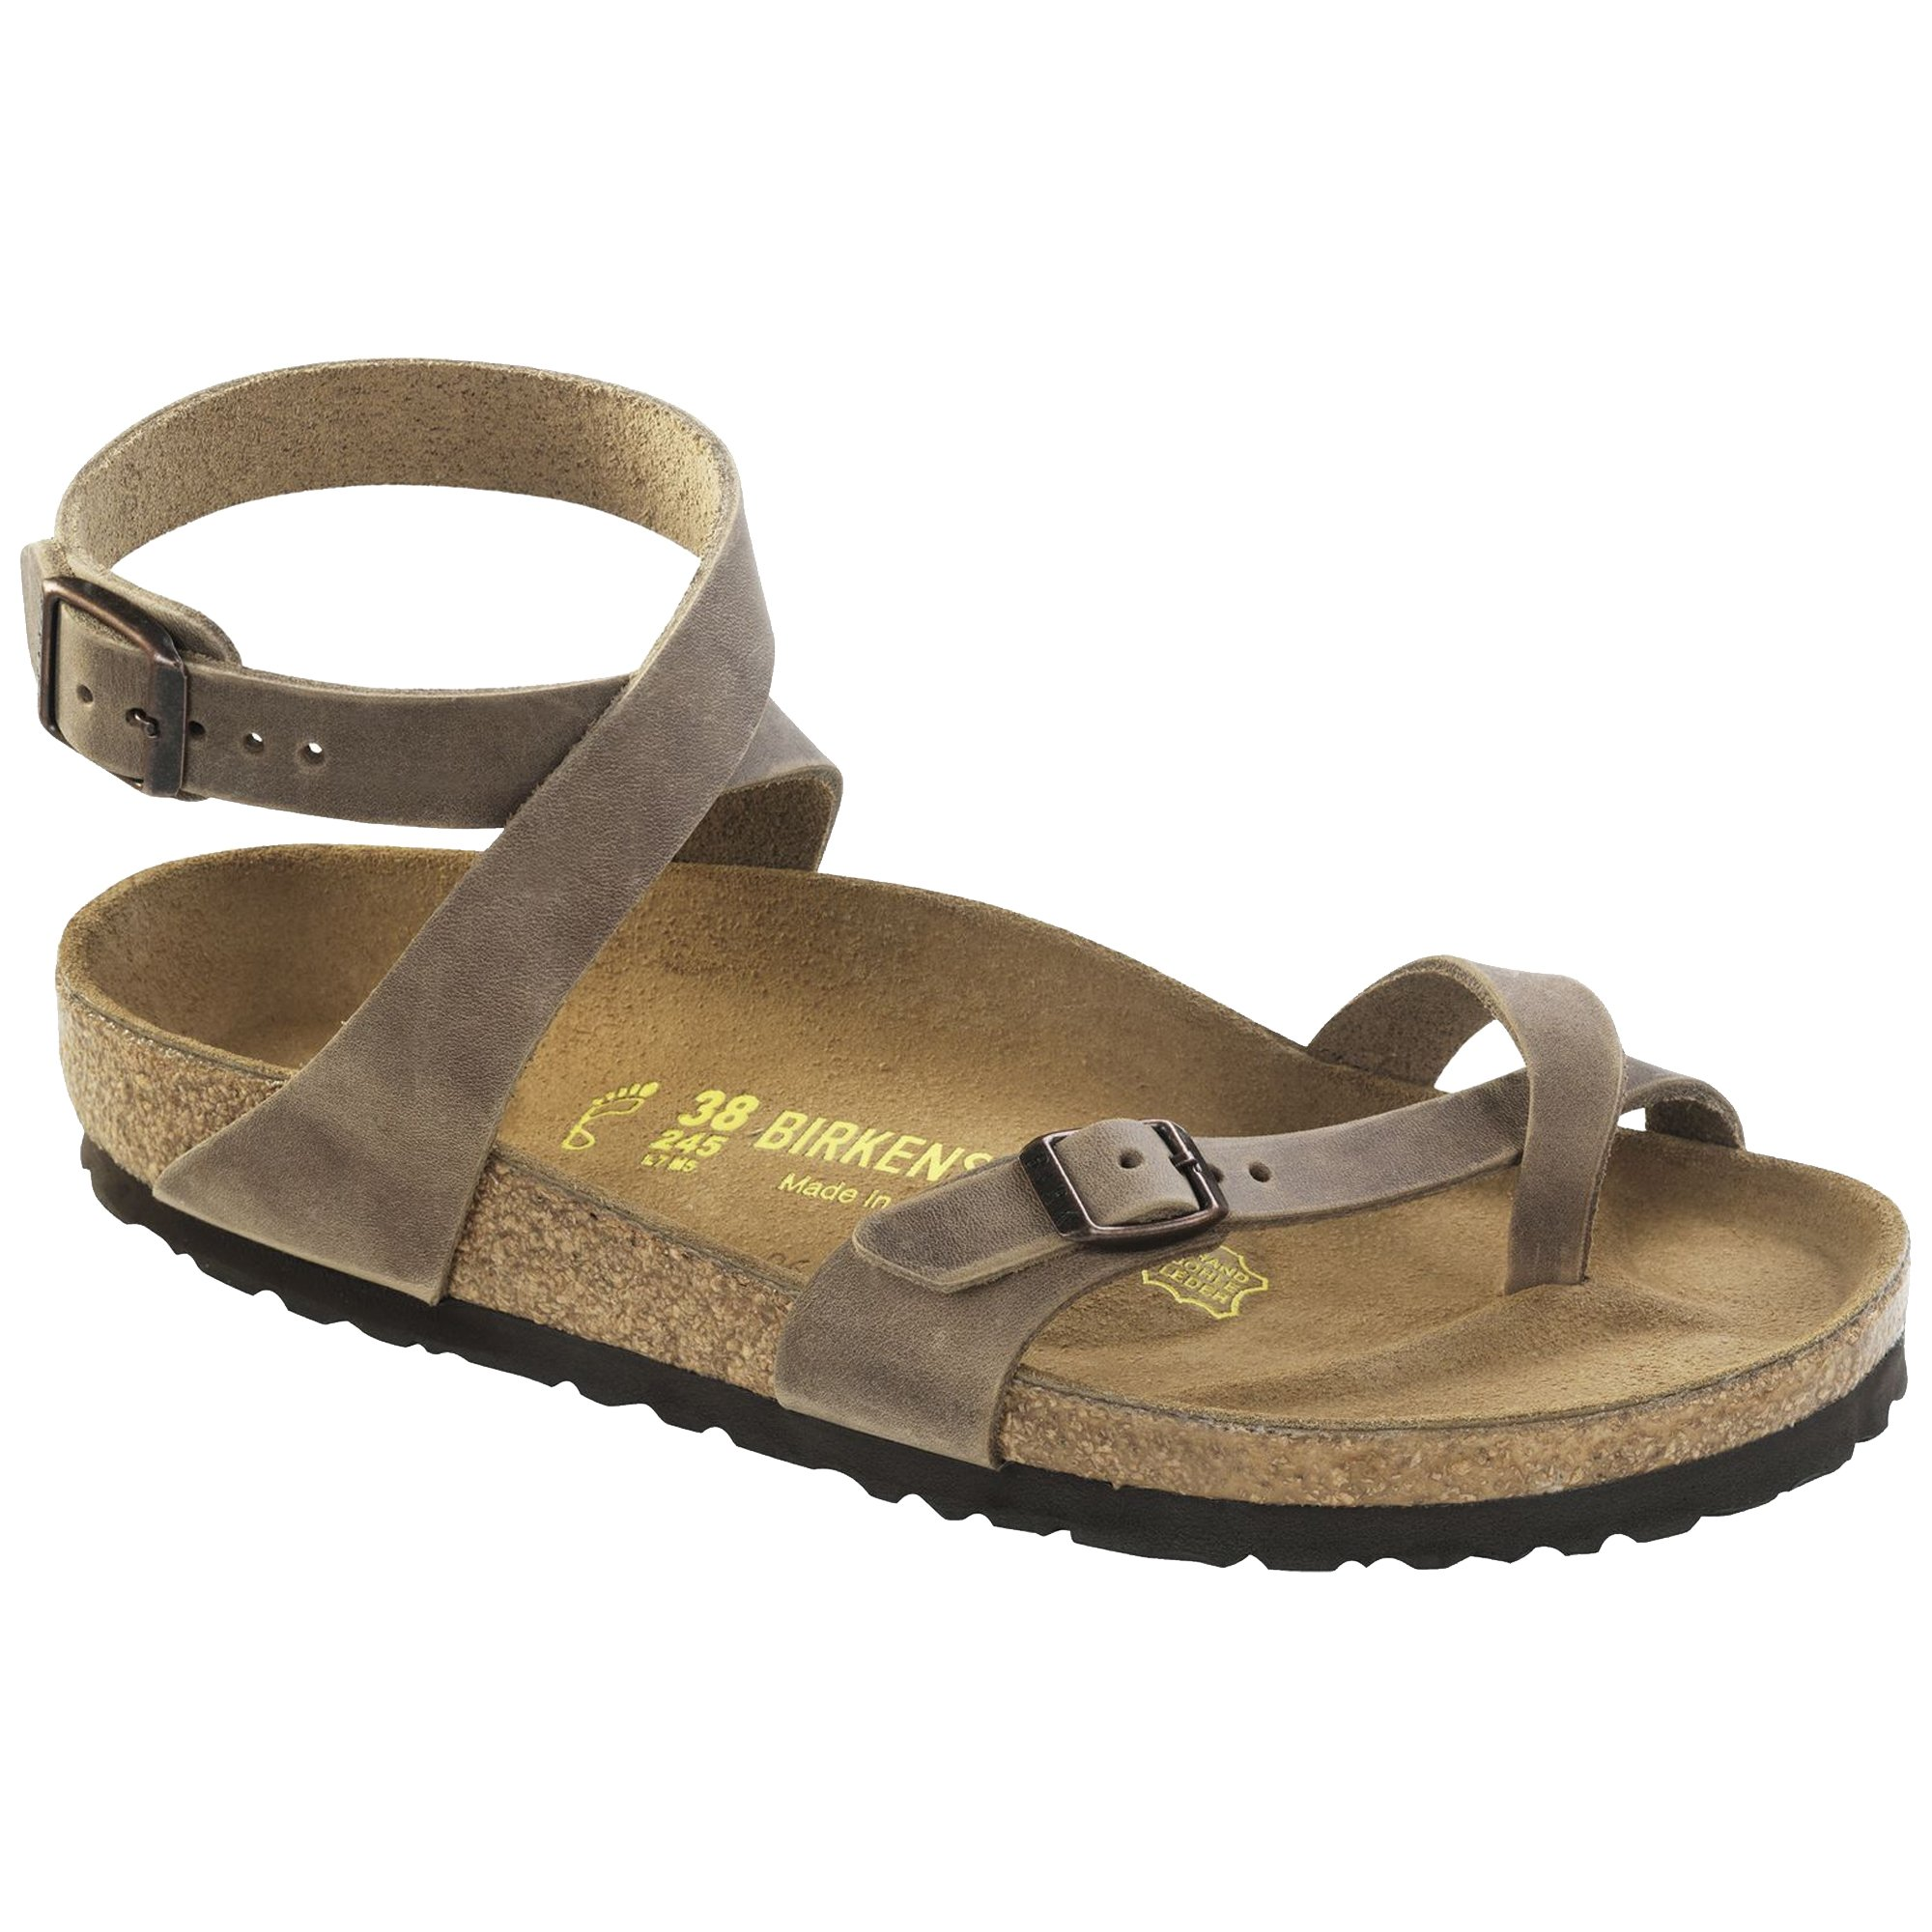 Birkenstock Women's Yara Tobacco Oiled Leather Sandals 39 (US Women's 8-8.5)